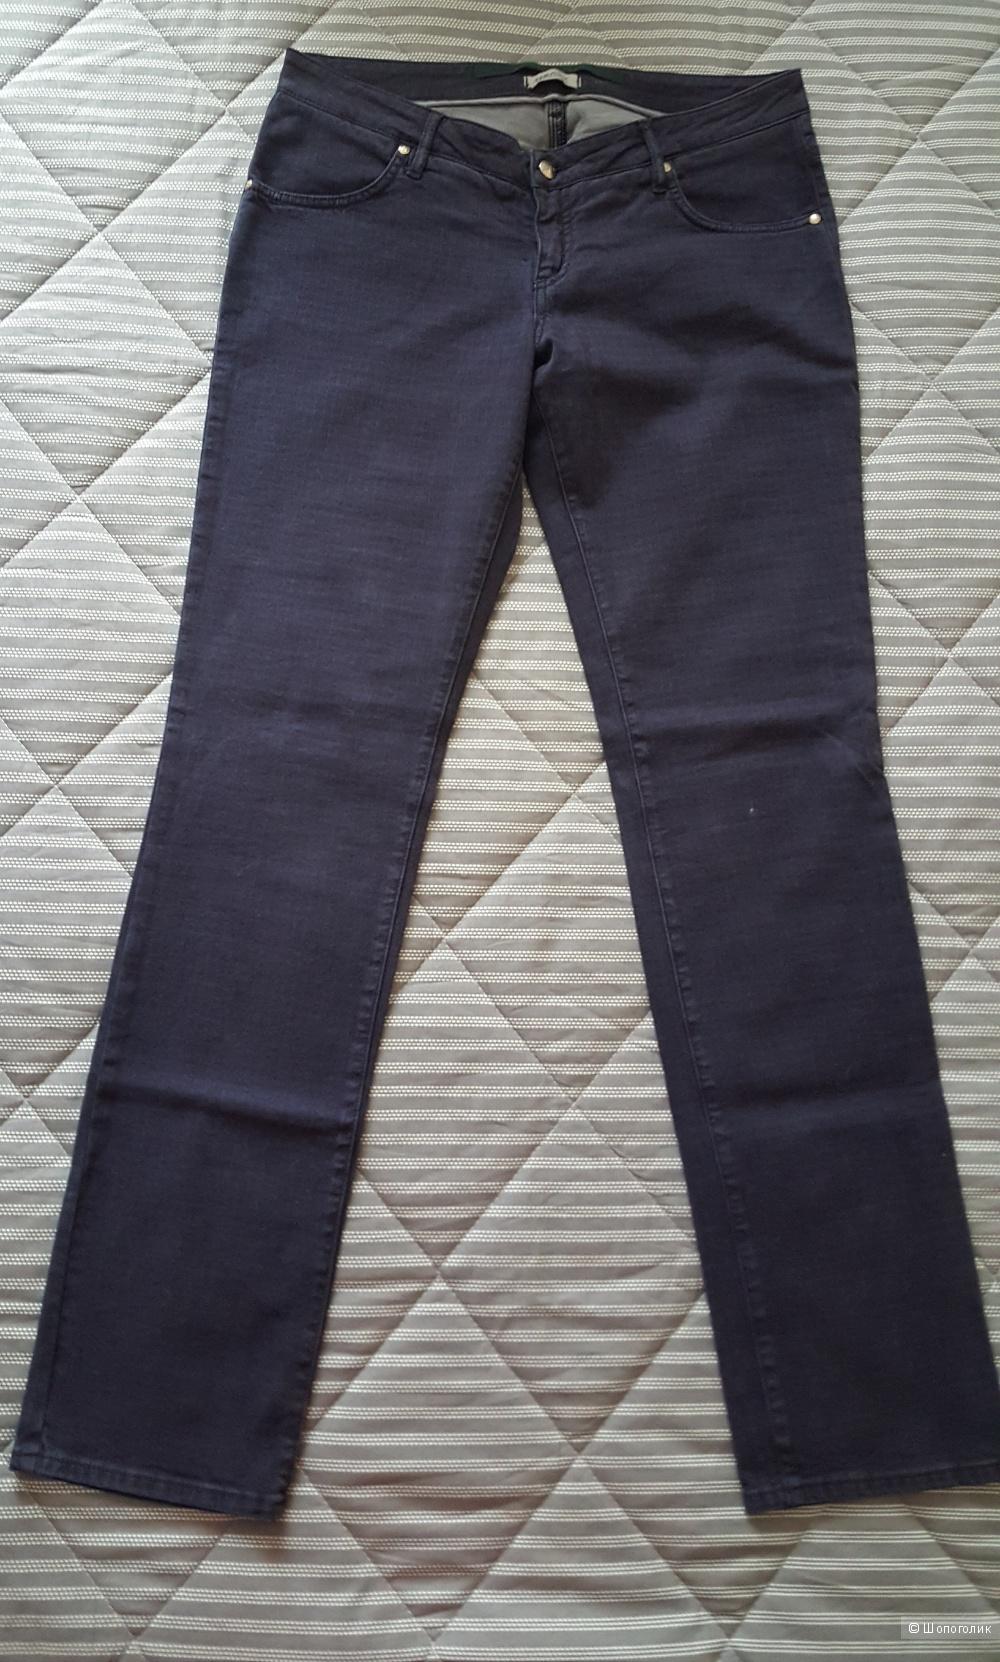 Брюки в джинсовом стиле Heavy Project р. 32